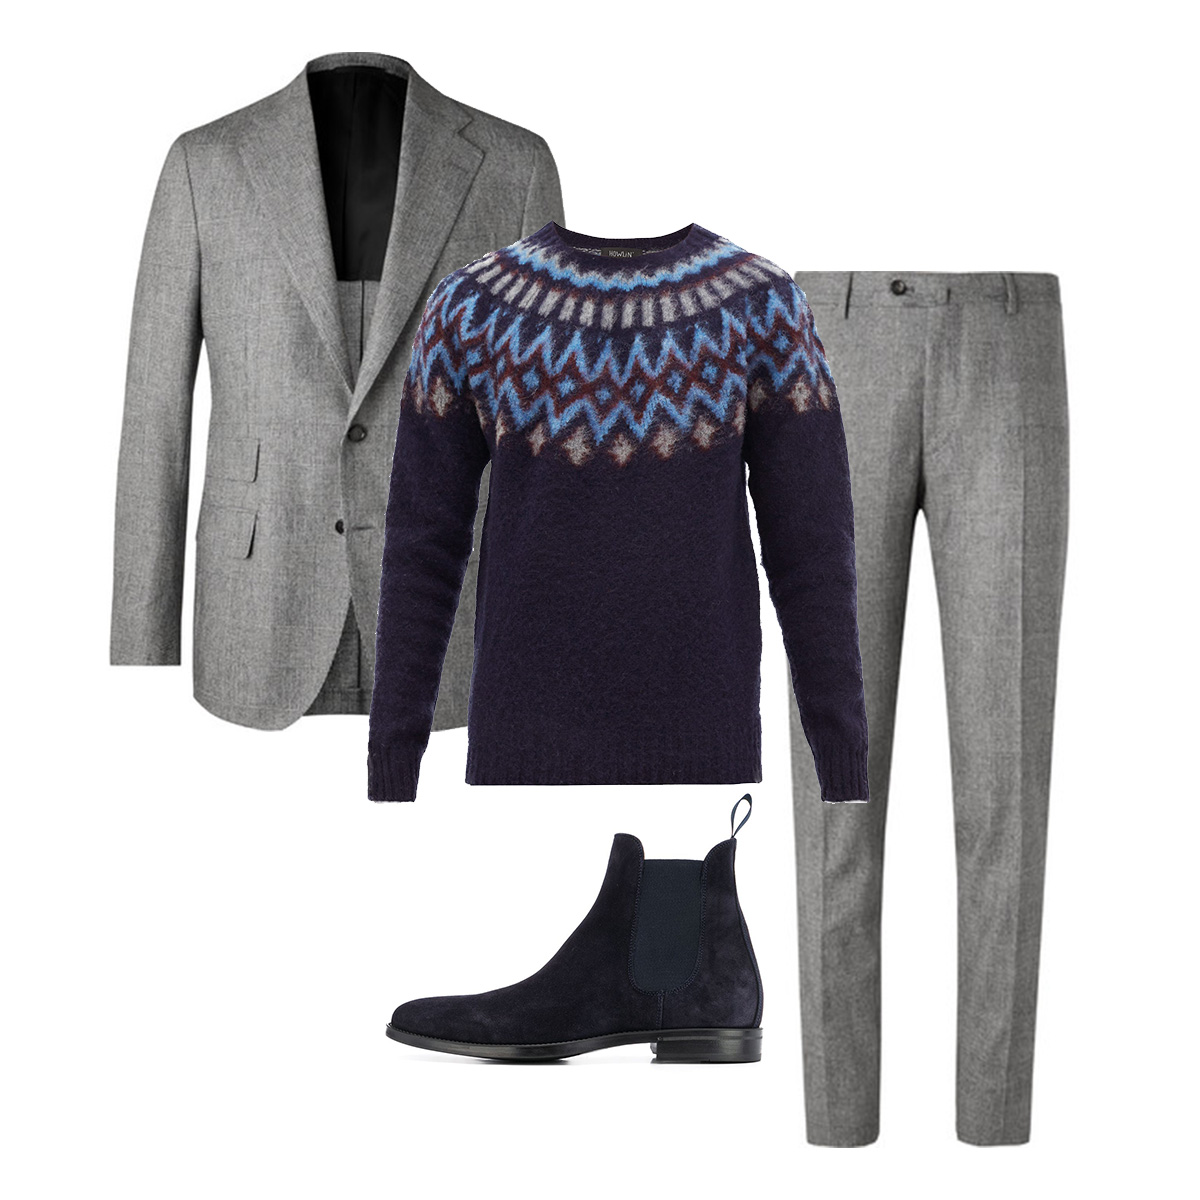 Пиджак De Petrillo, £684; брюки De Petrillo, £225; свитер Howlin', €162; обувь Scarosso, 14788 рублей